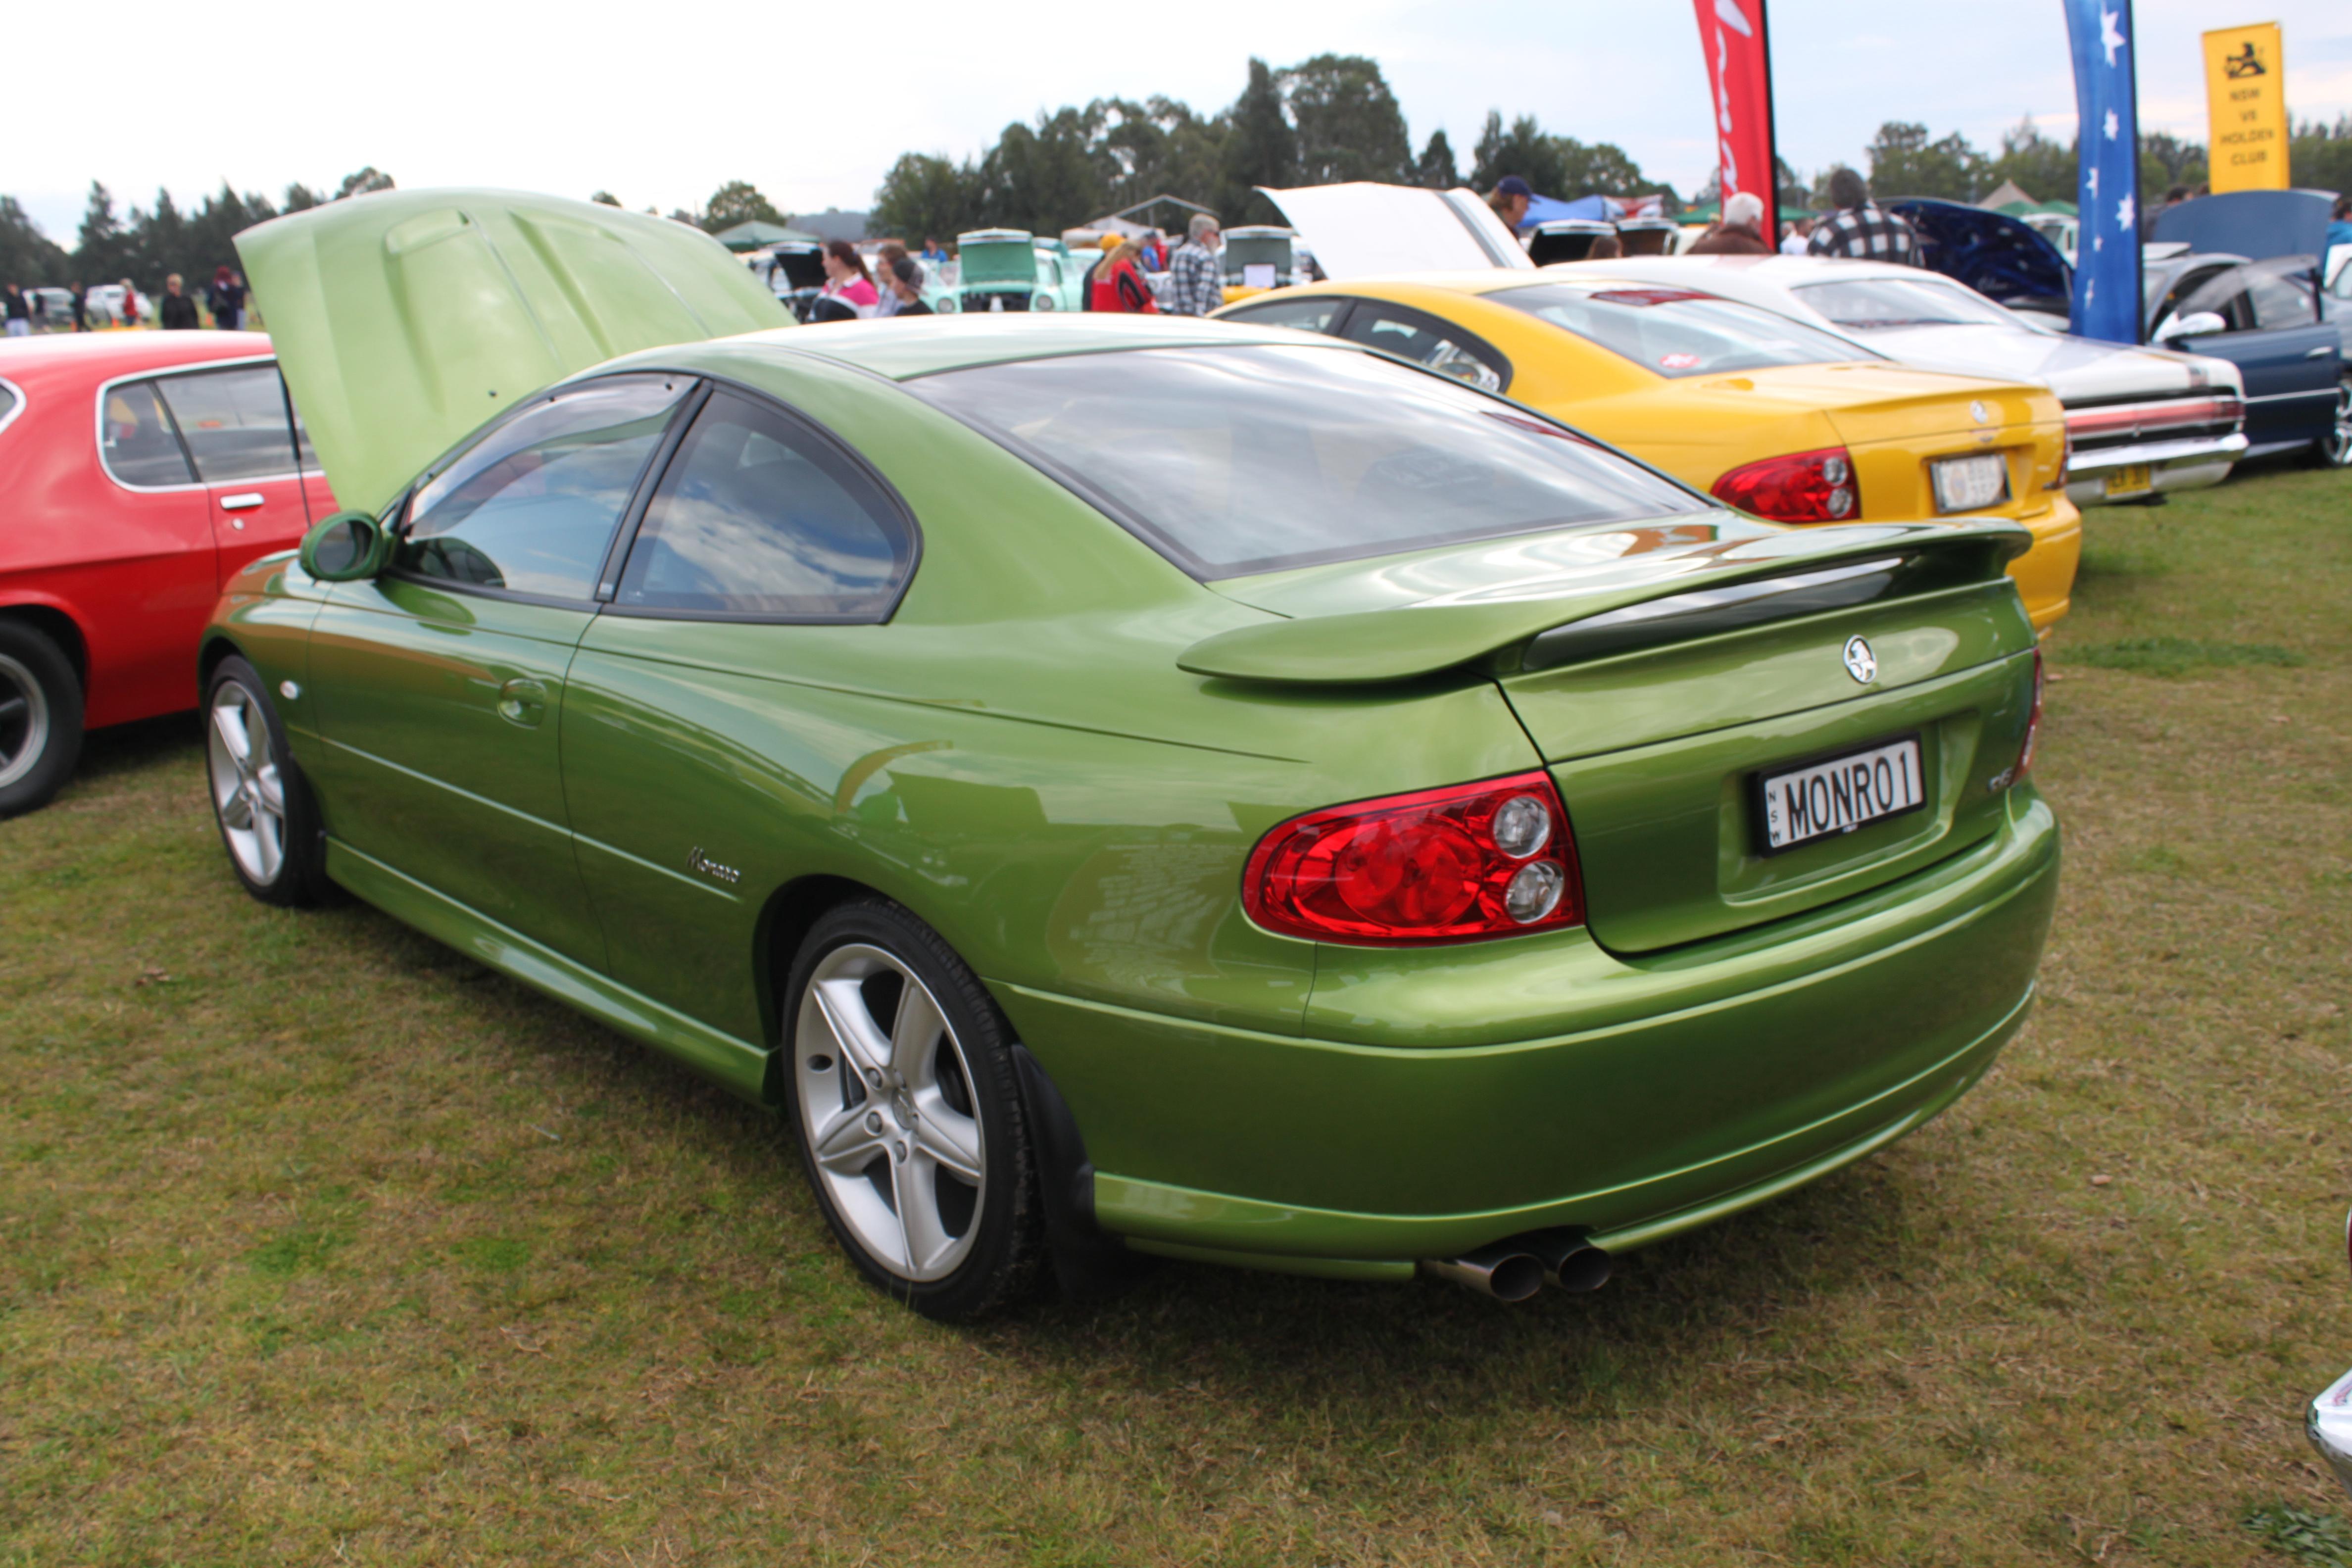 File:2002 Holden Monaro (V2) CV8 coupe (15688993989).jpg - Wikimedia